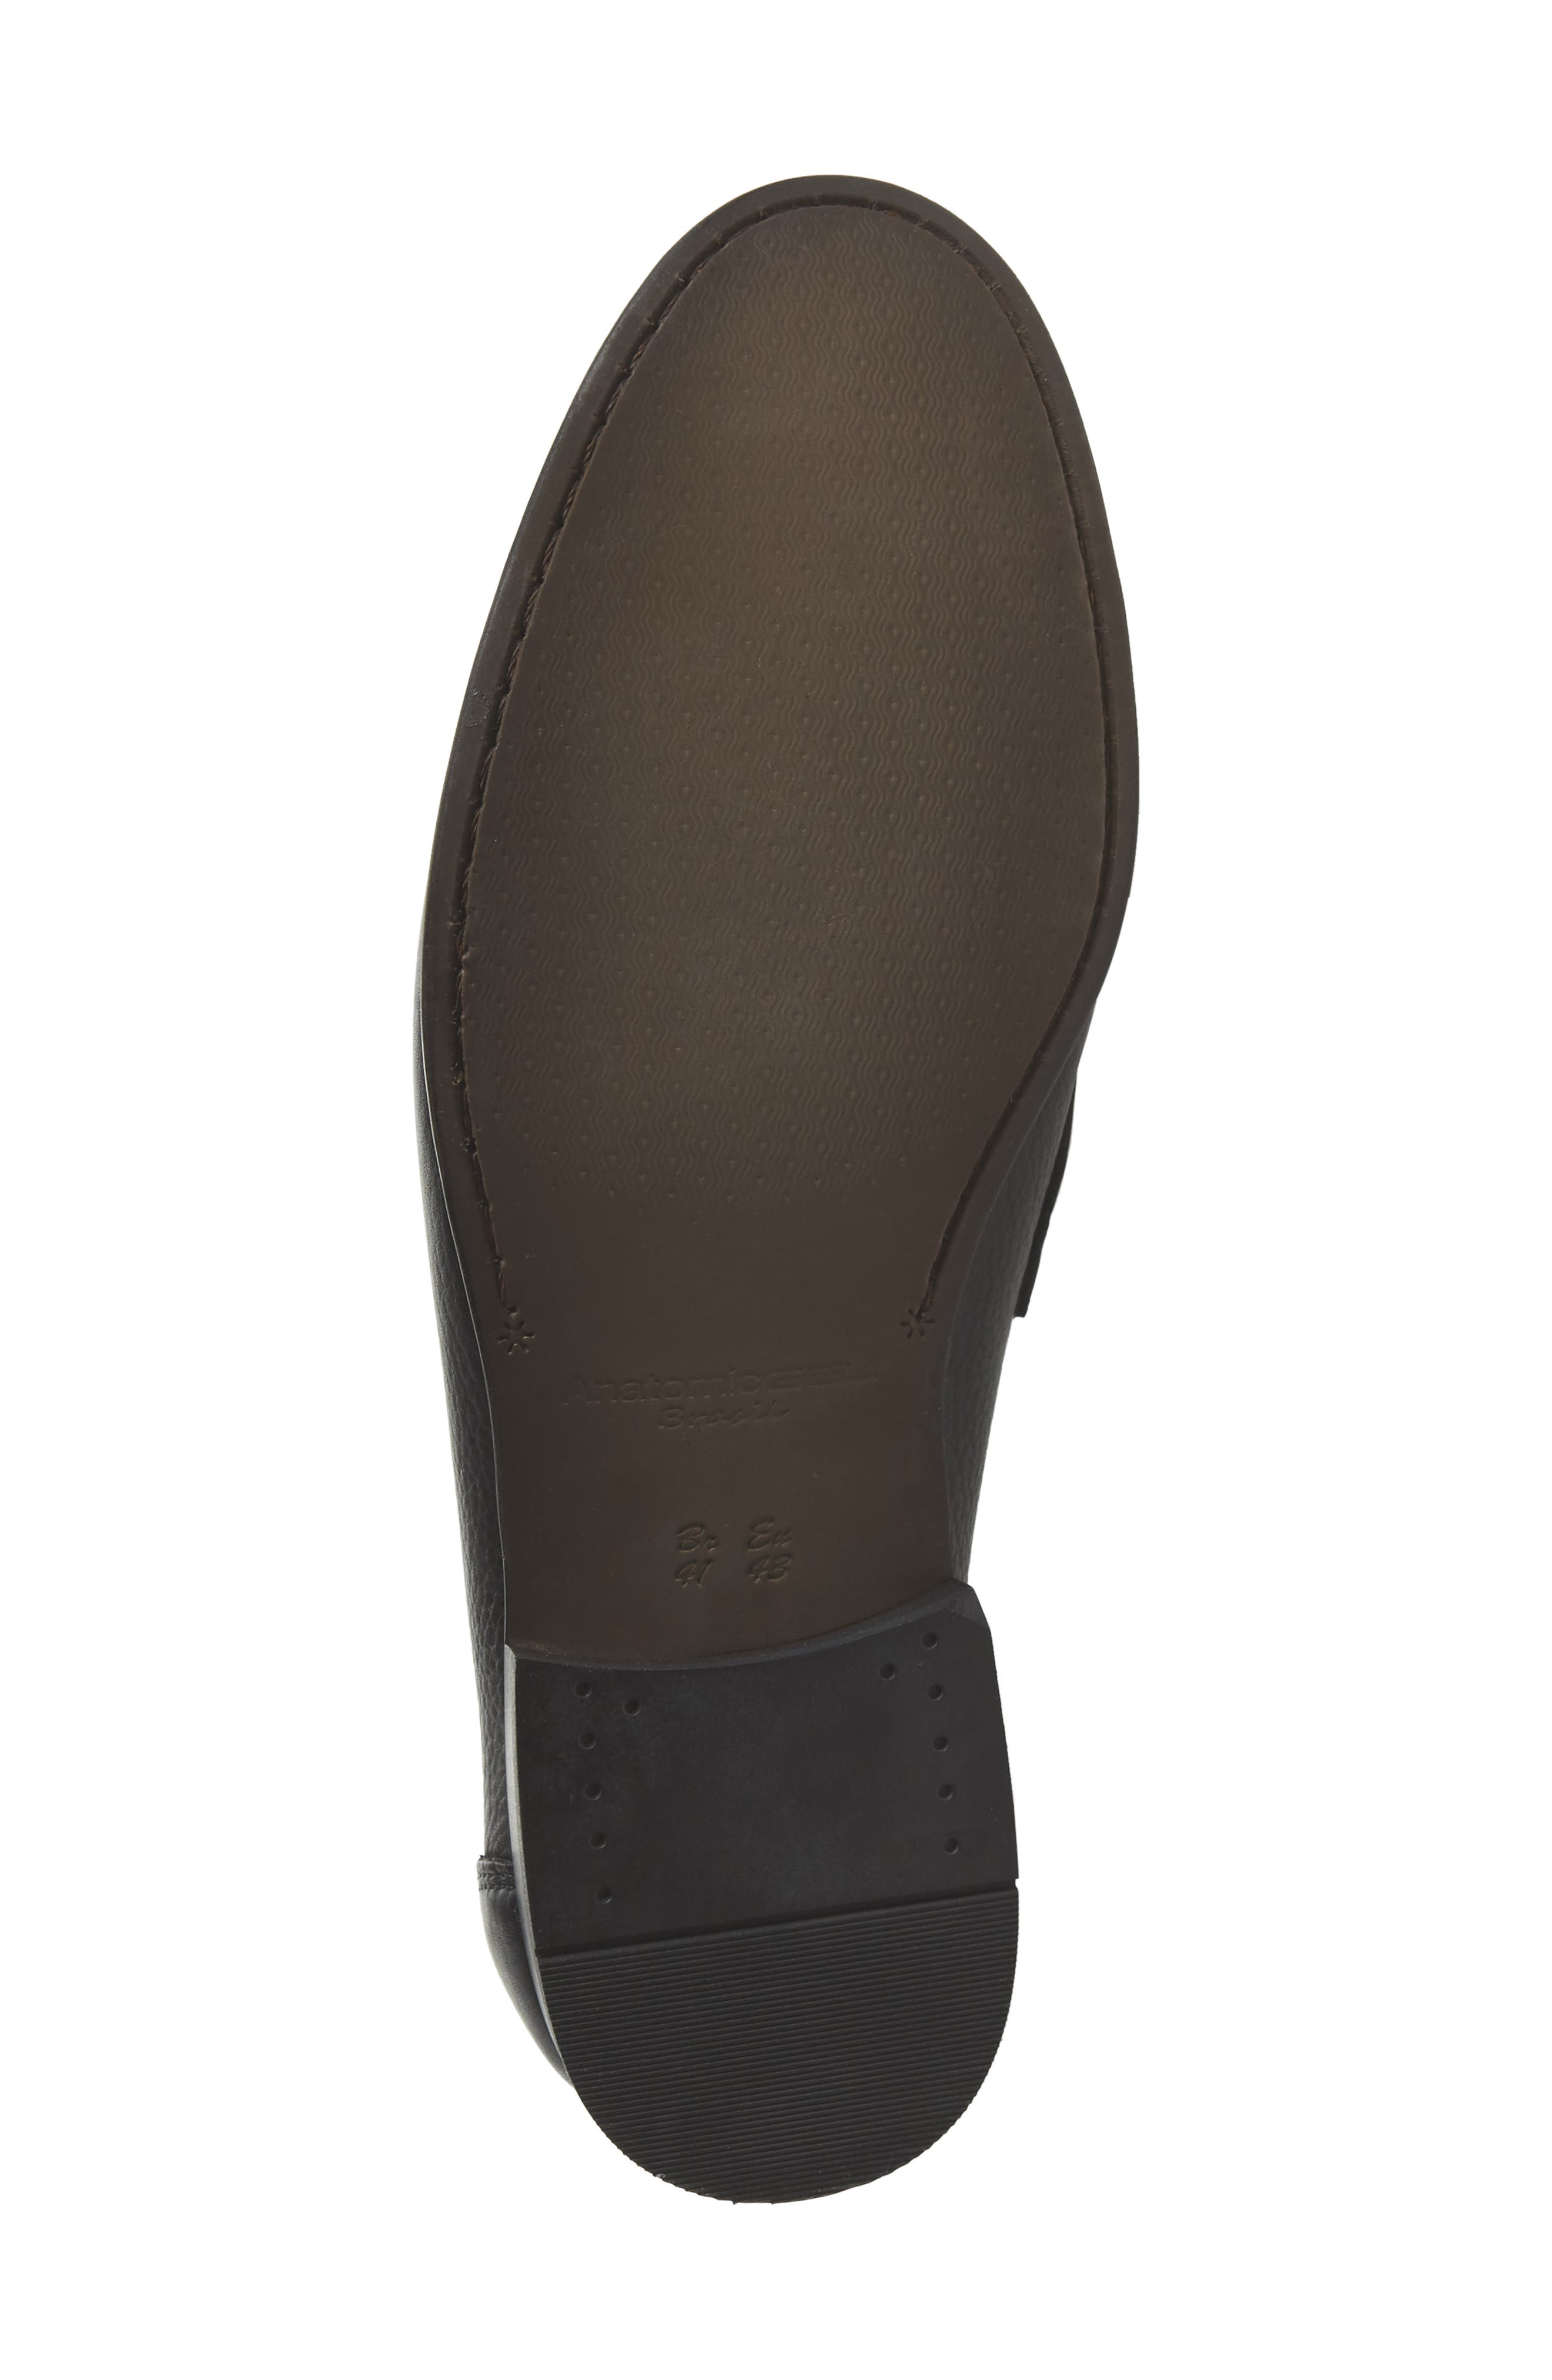 Eric Moc Toe Slip-On Loafer,                             Alternate thumbnail 6, color,                             Floater Black Leather